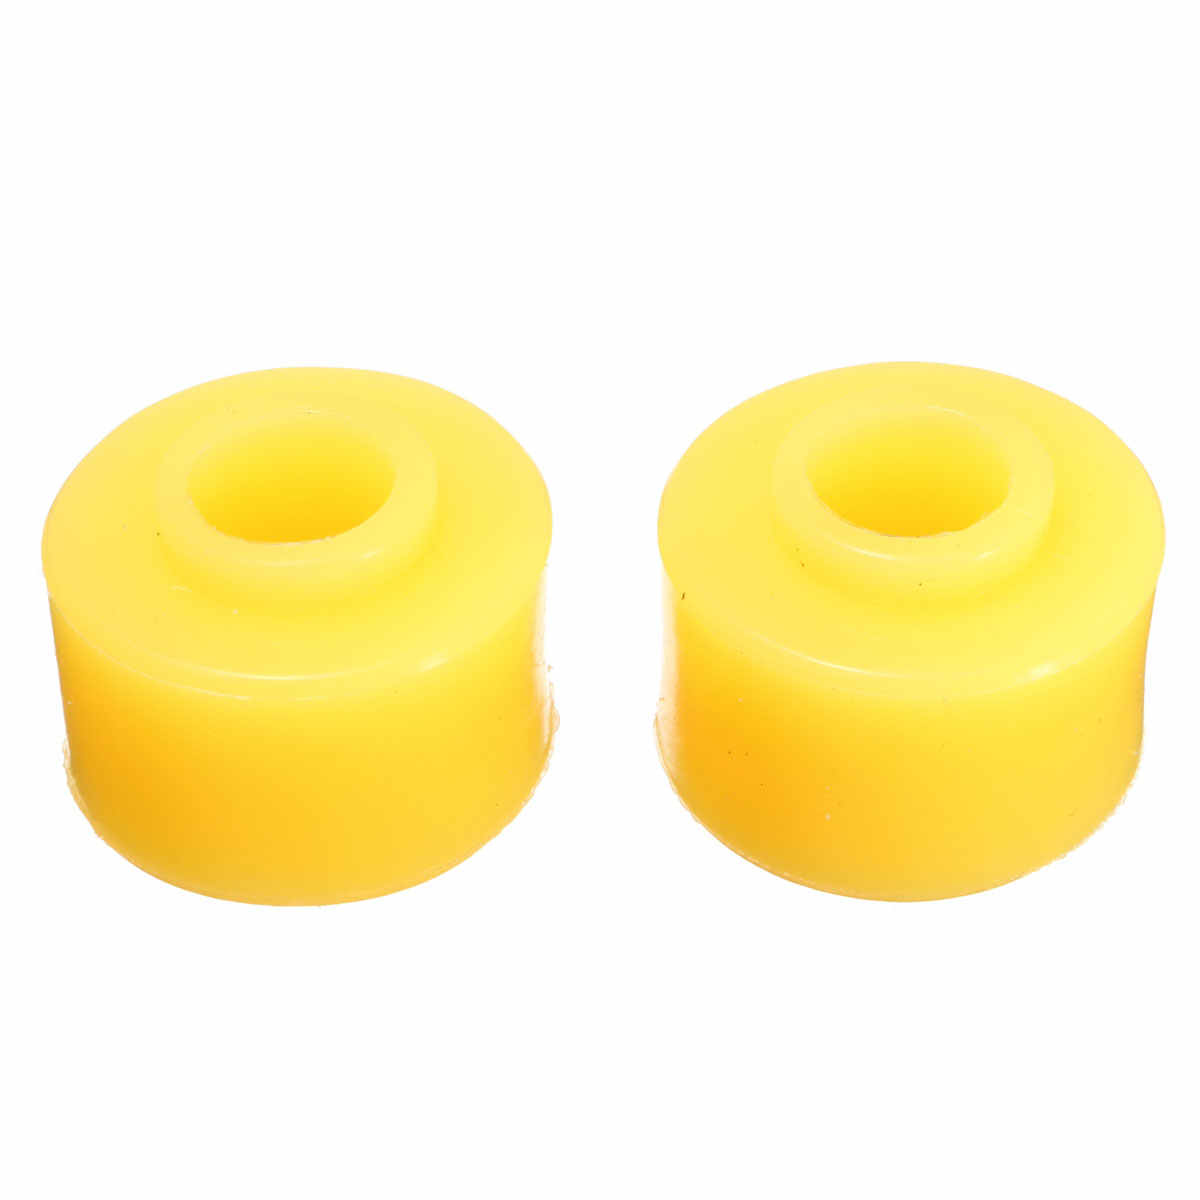 10mm 10 Pcs הפנימי Dia צהוב גומי הלם בולם תותבים חלק אוטומטי רכב